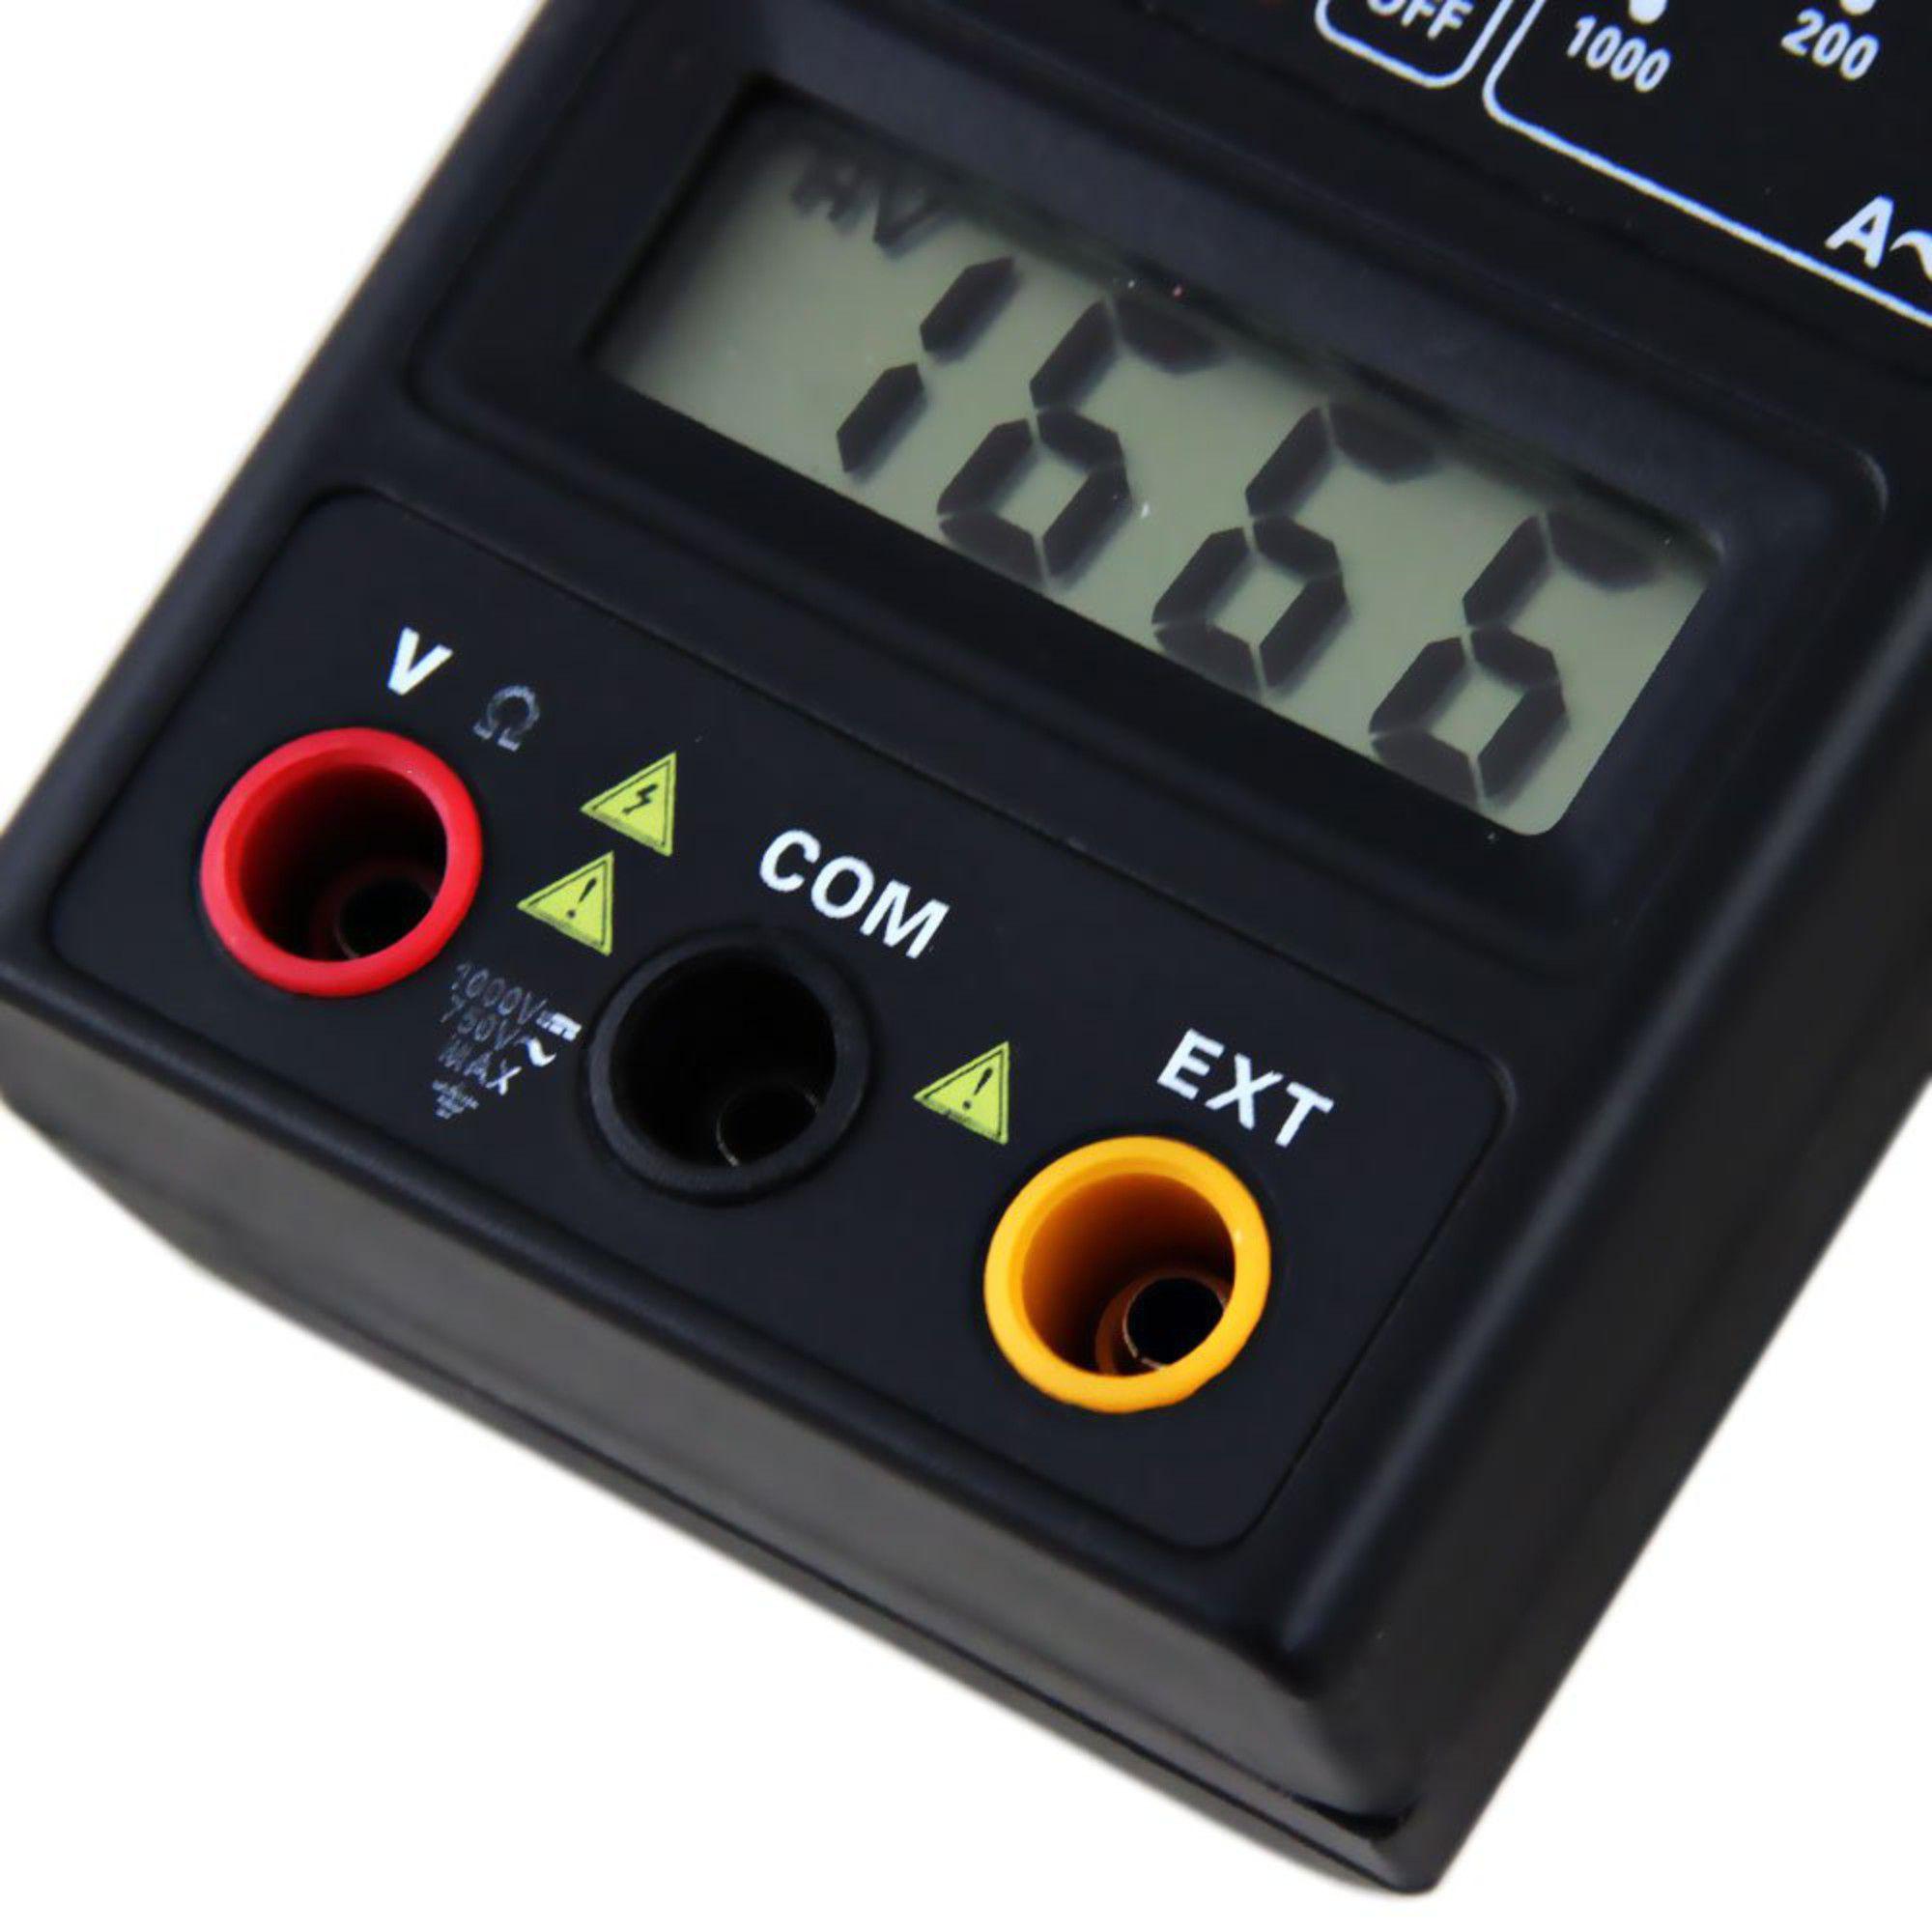 Alicate Amperímetro Digital Profissional 600v Cat. Il Com Bip